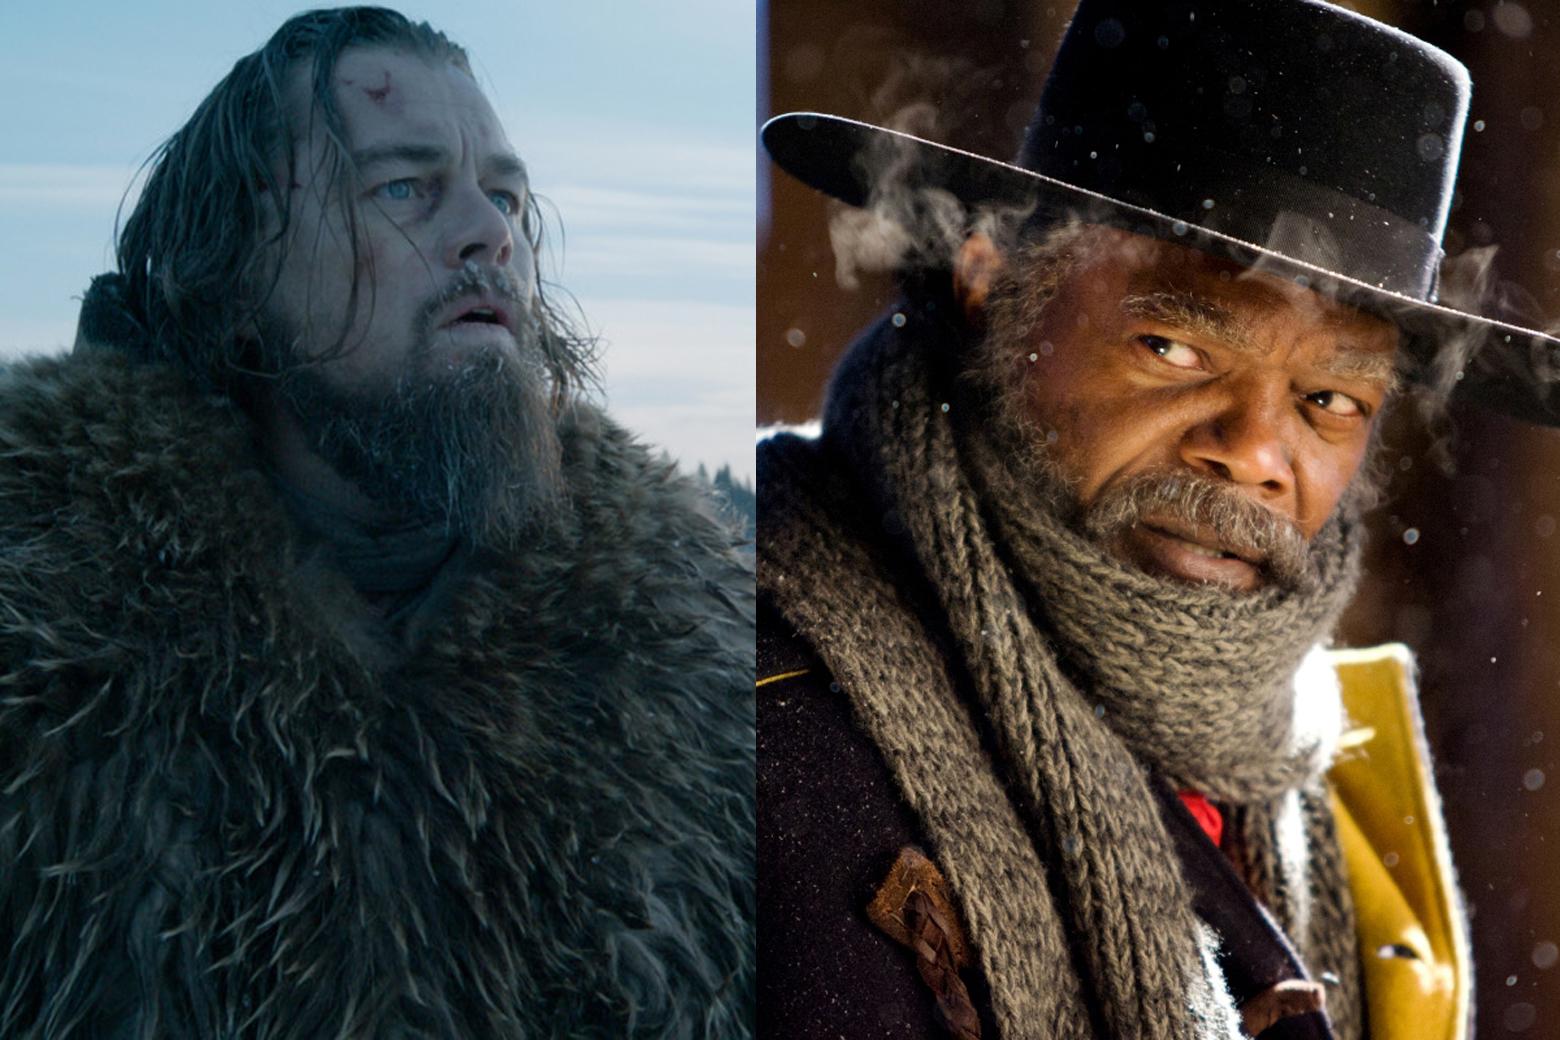 'Revenant,' 'Hateful Eight' turn violent westerns into high art